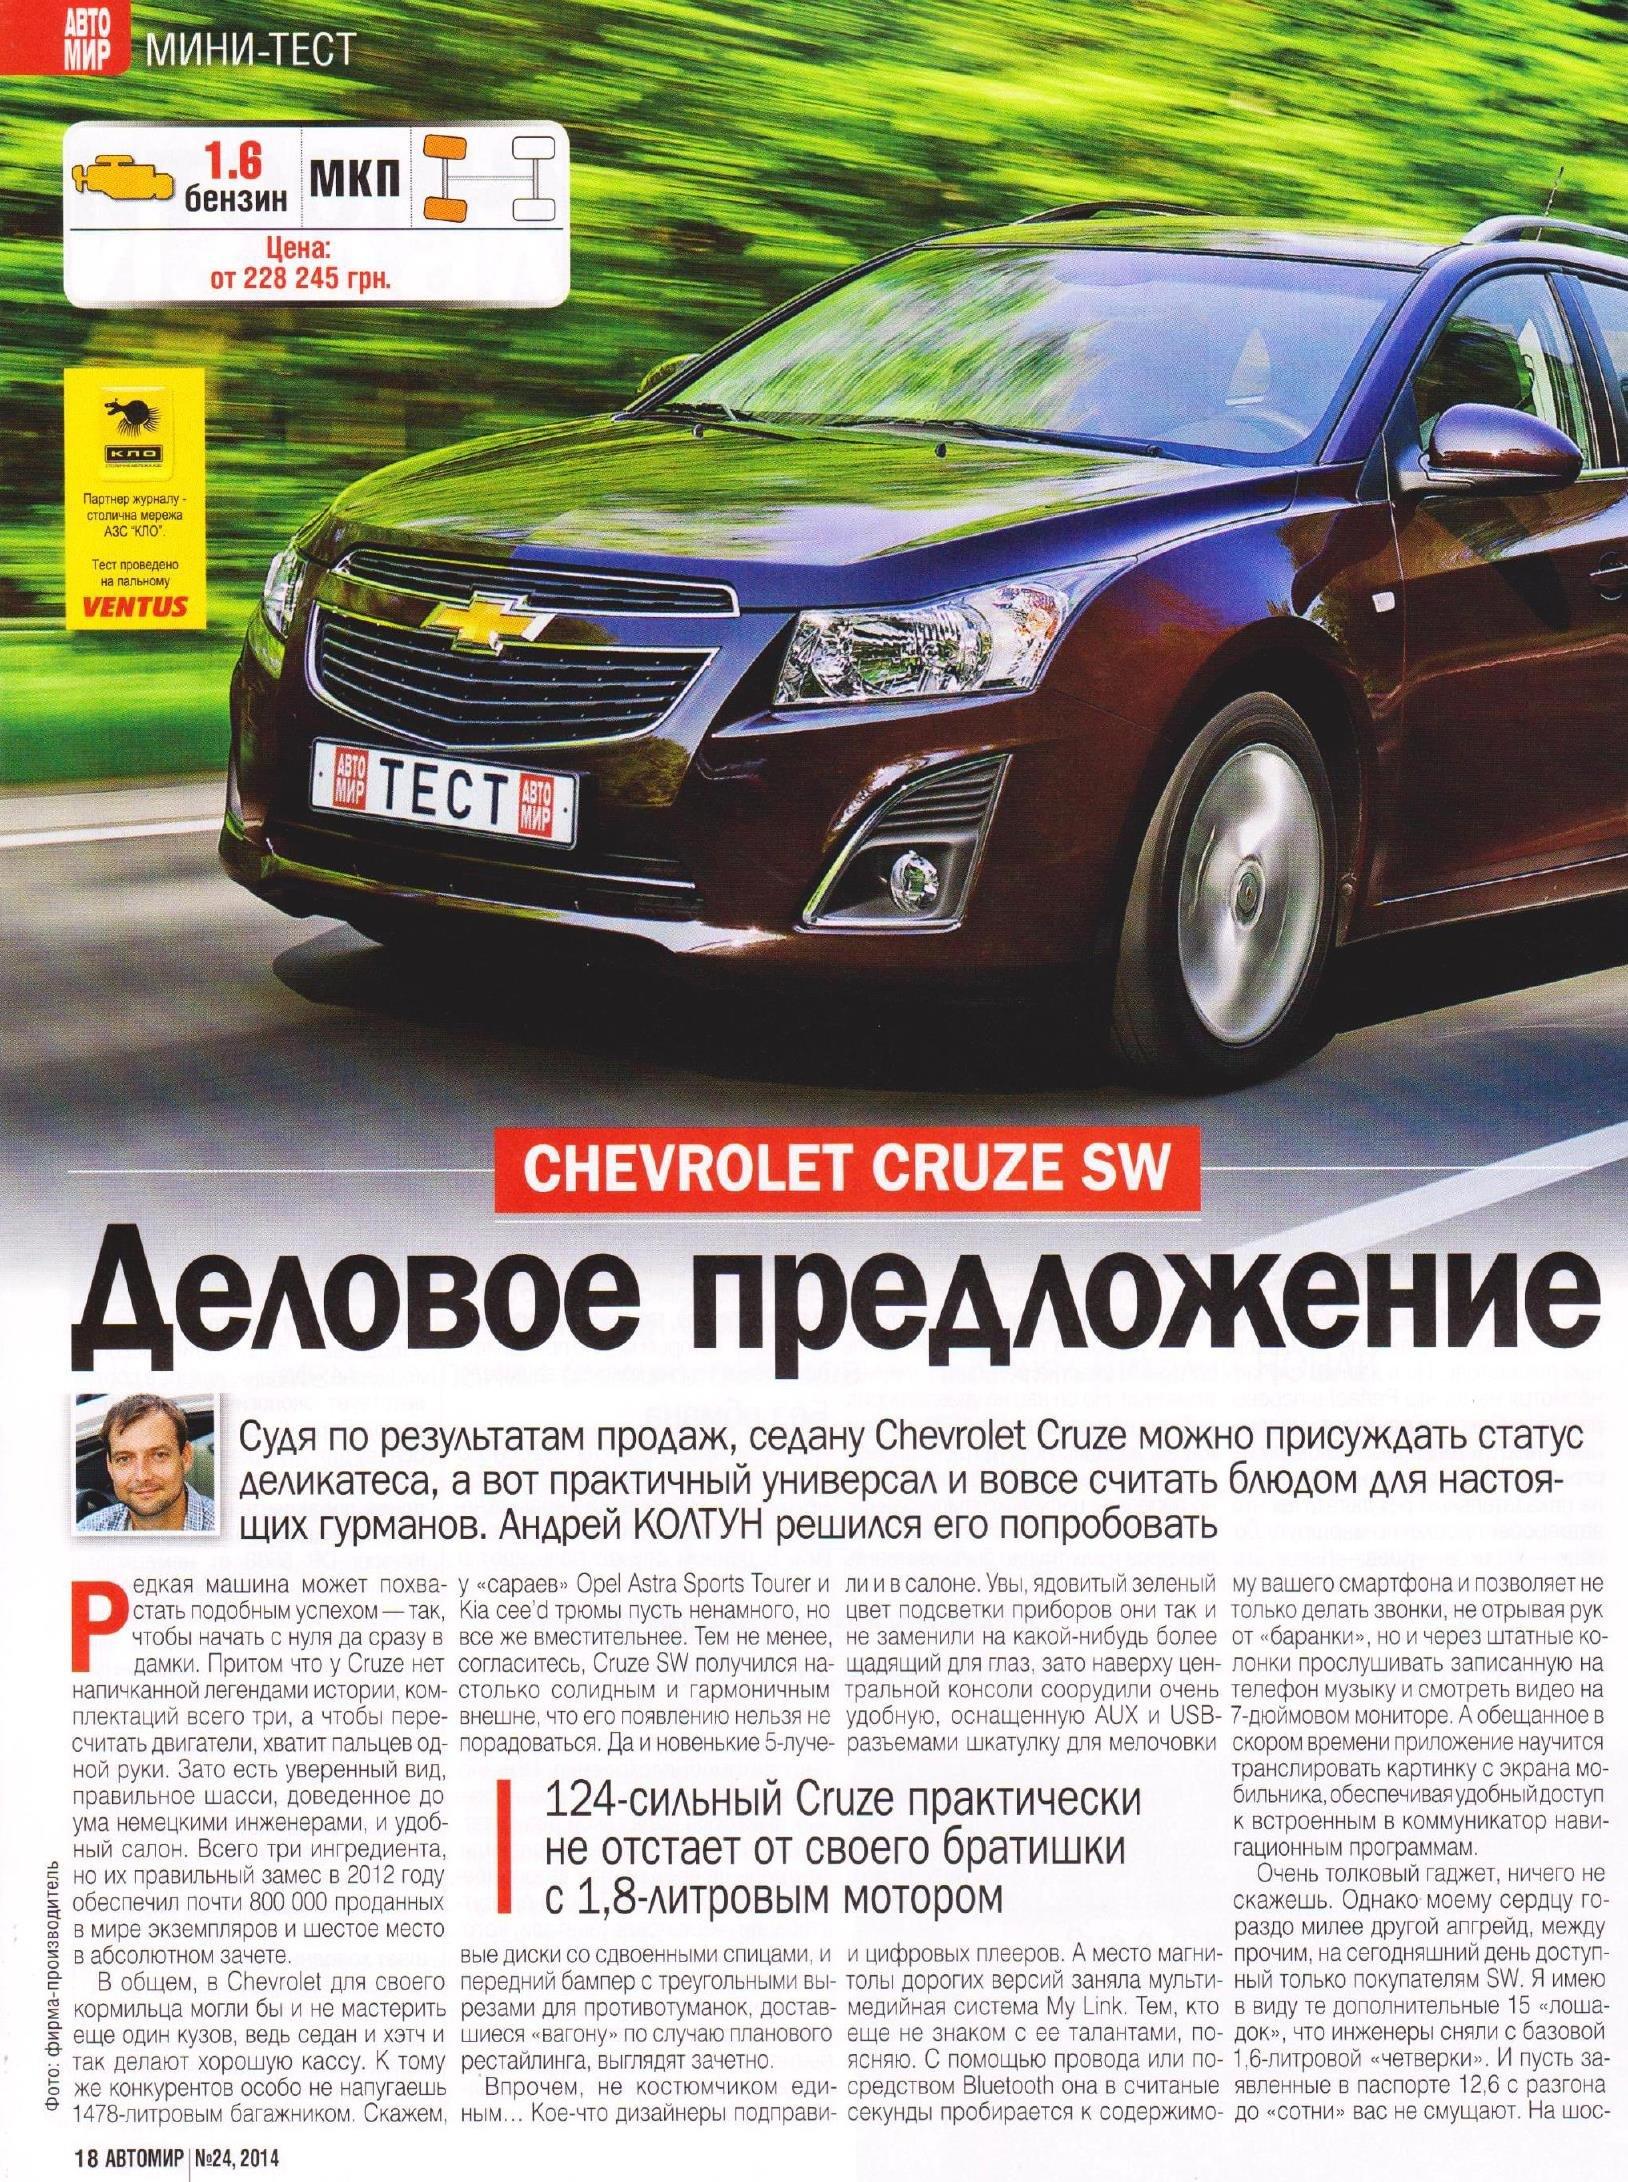 Автомир №24 (июнь 2014 / Украина) PDF